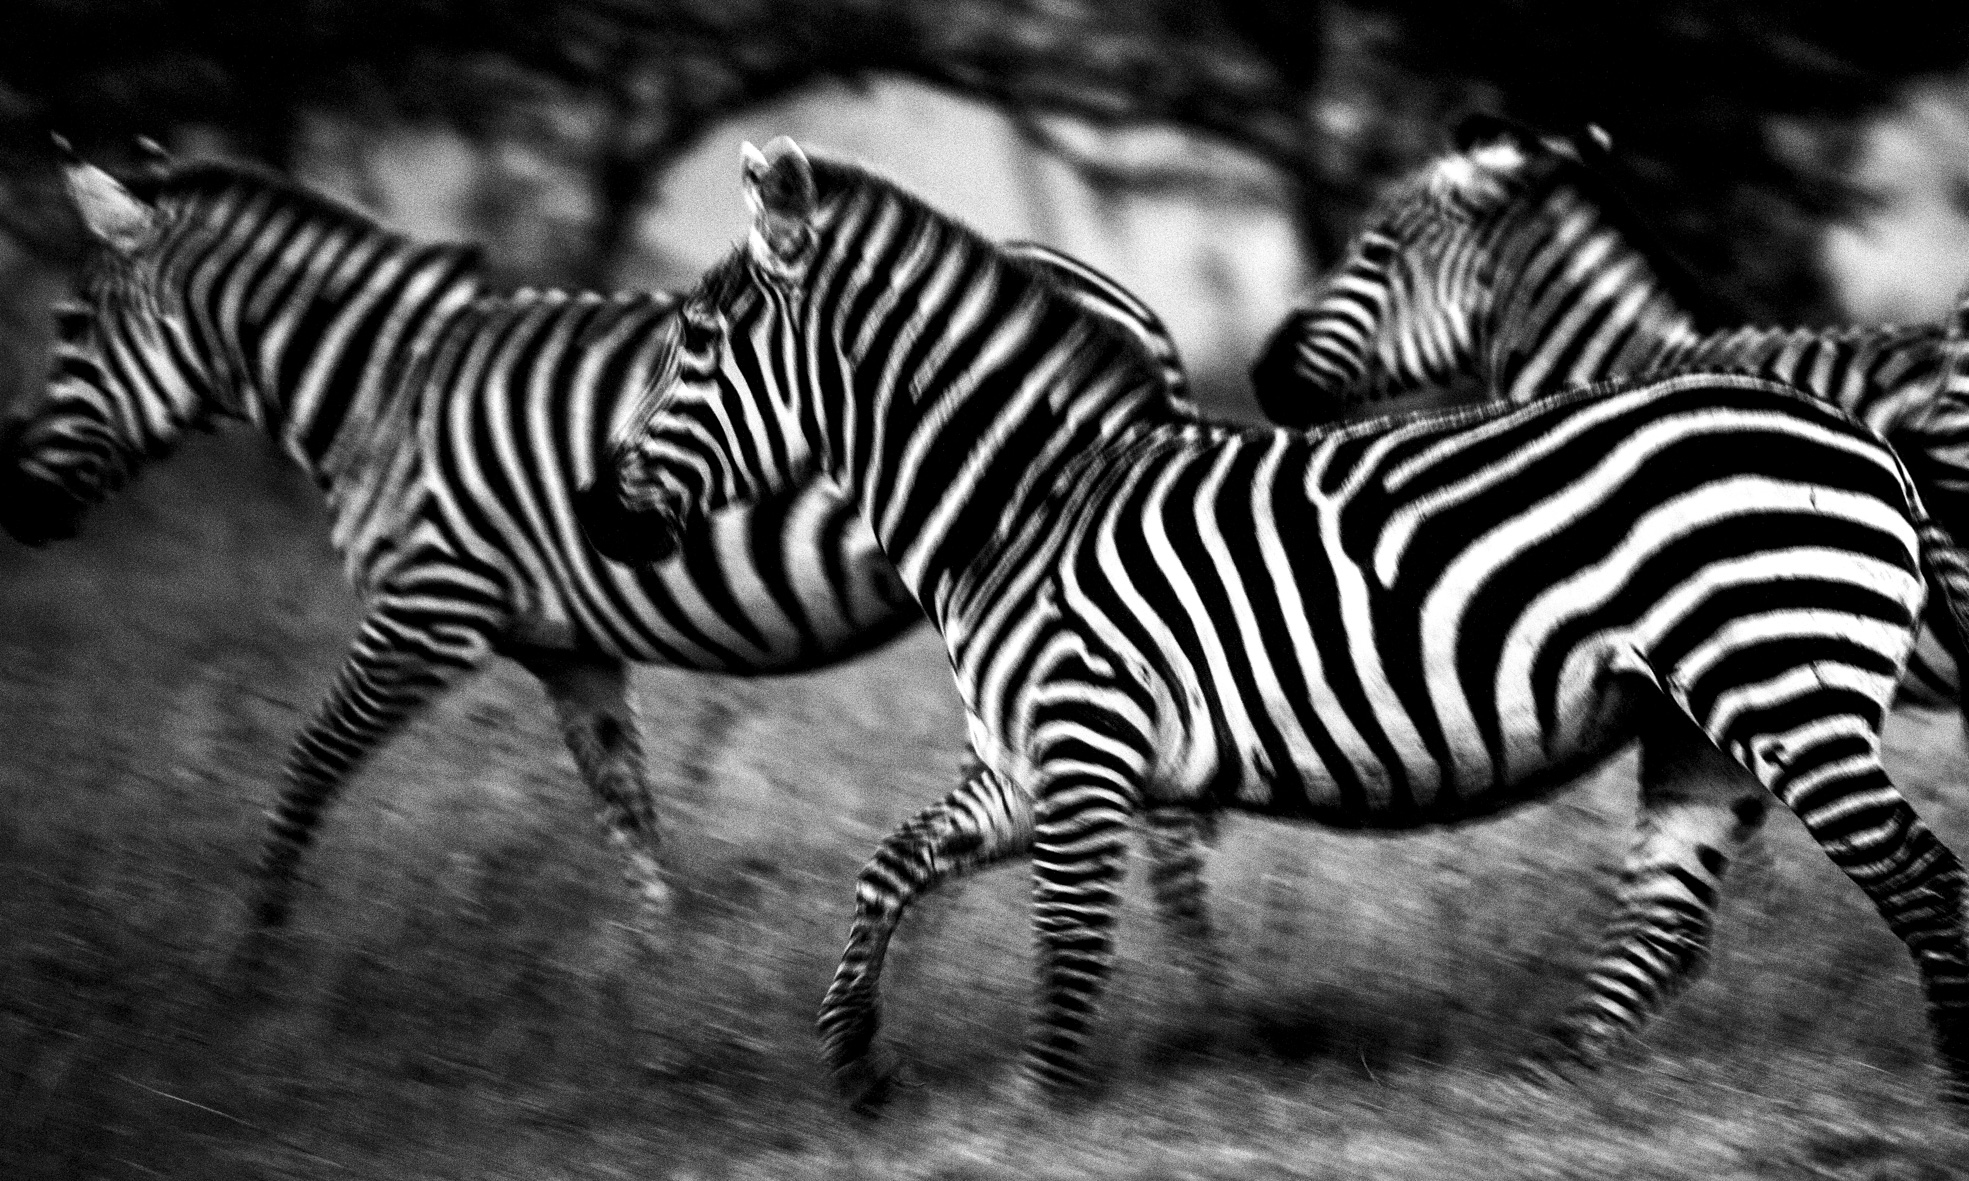 David Crookes | Wildlife